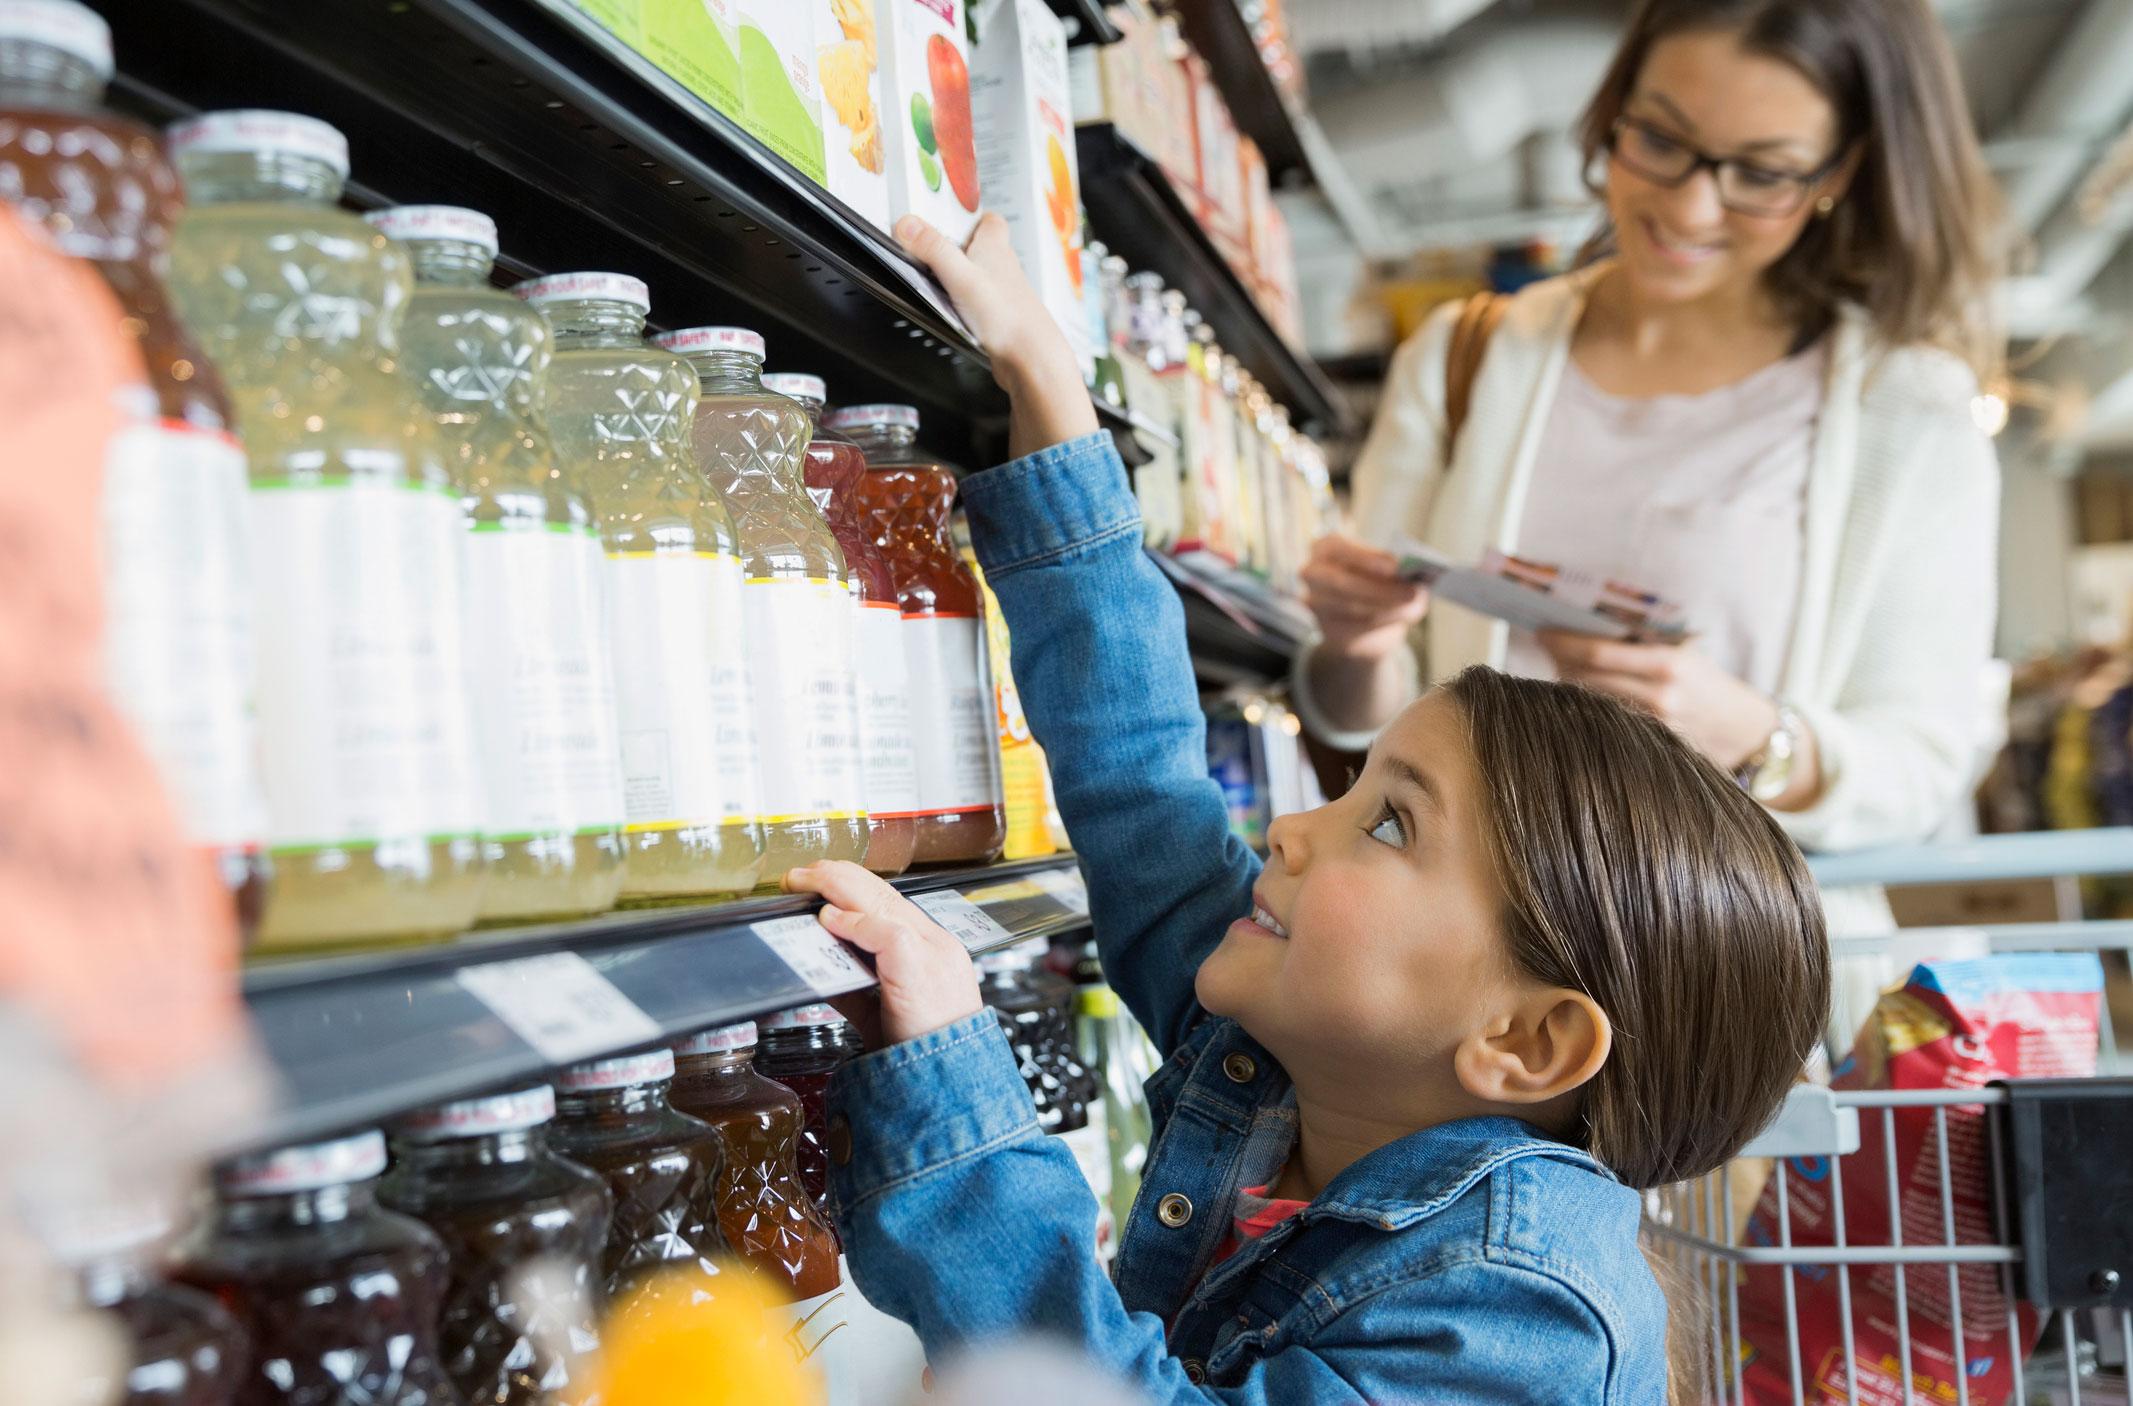 girl reaching for juice on shelf in market